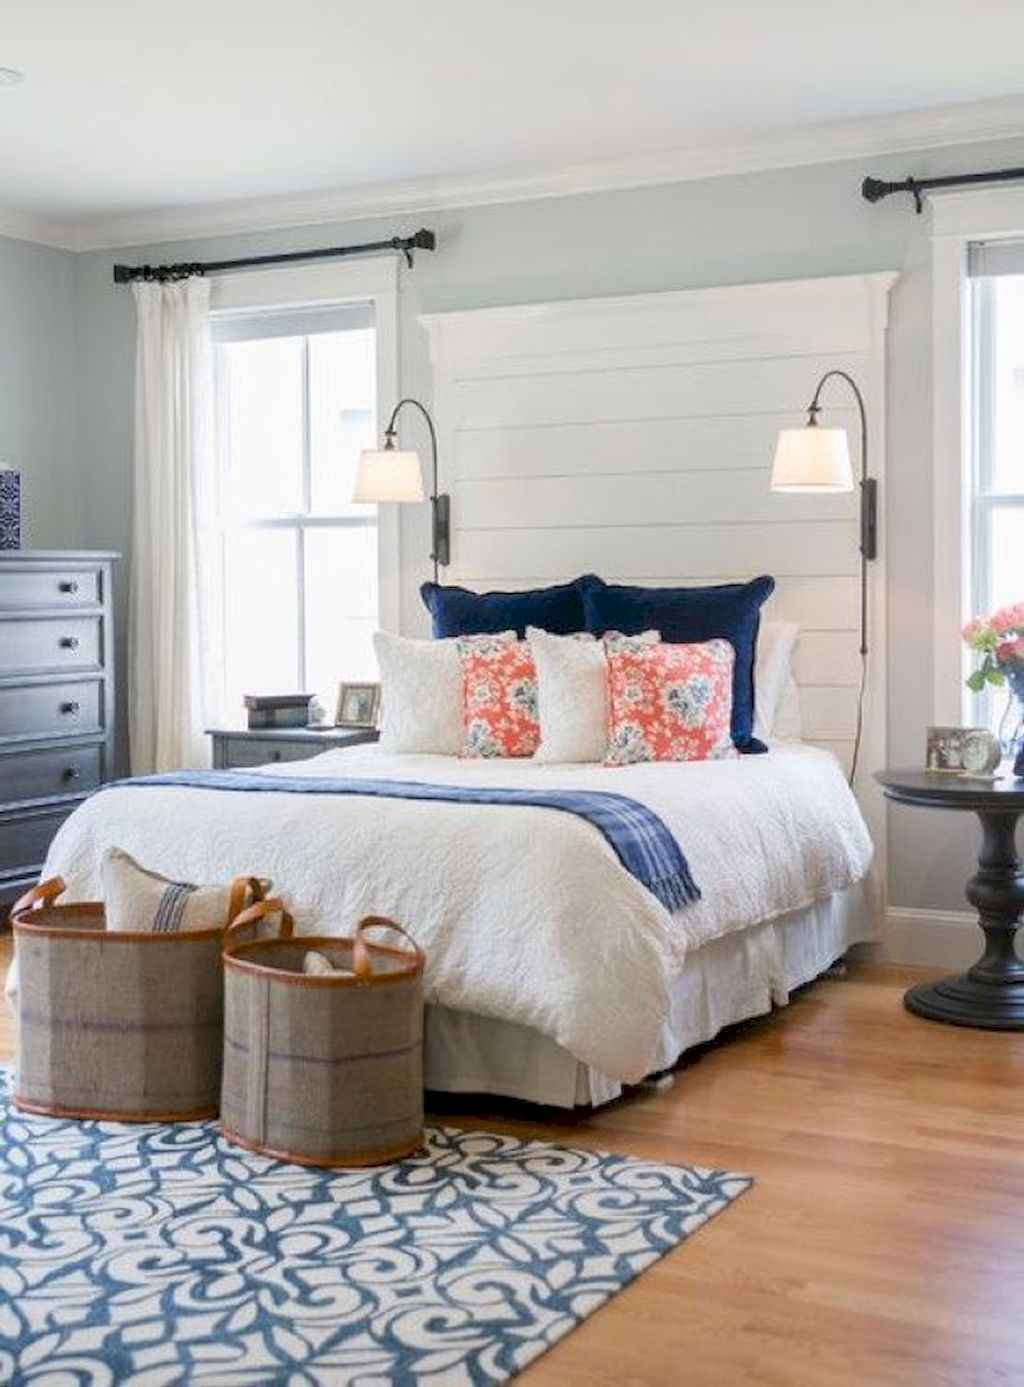 Incredible master bedroom ideas (14)